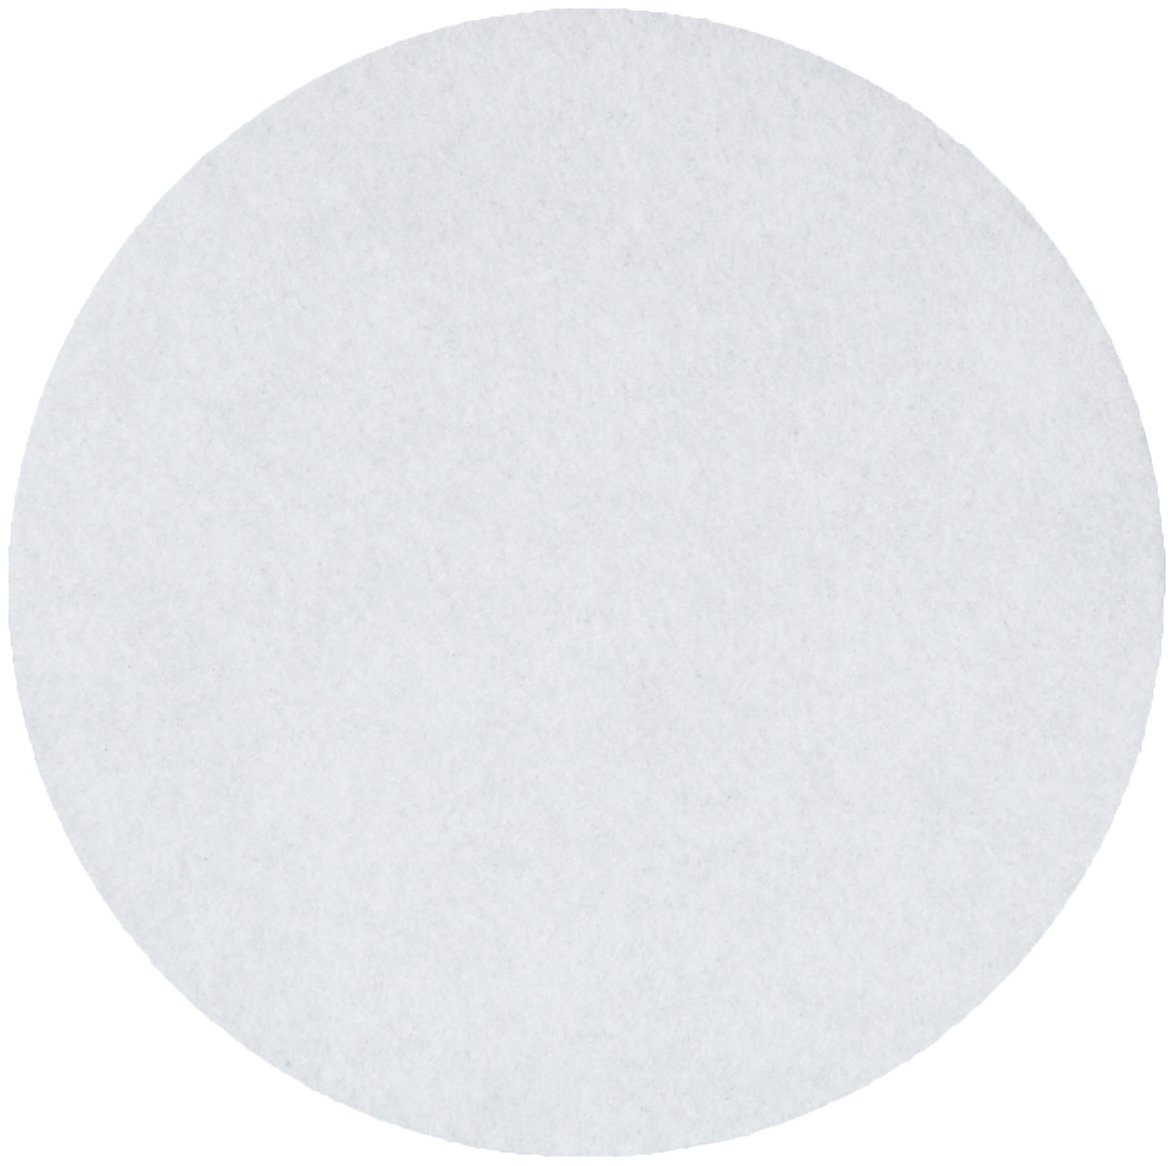 Pack of 100 70mm Diameter Grade 589//2 Whatman 10300108 Quantitative Filter Paper Circles 4-12 Micron